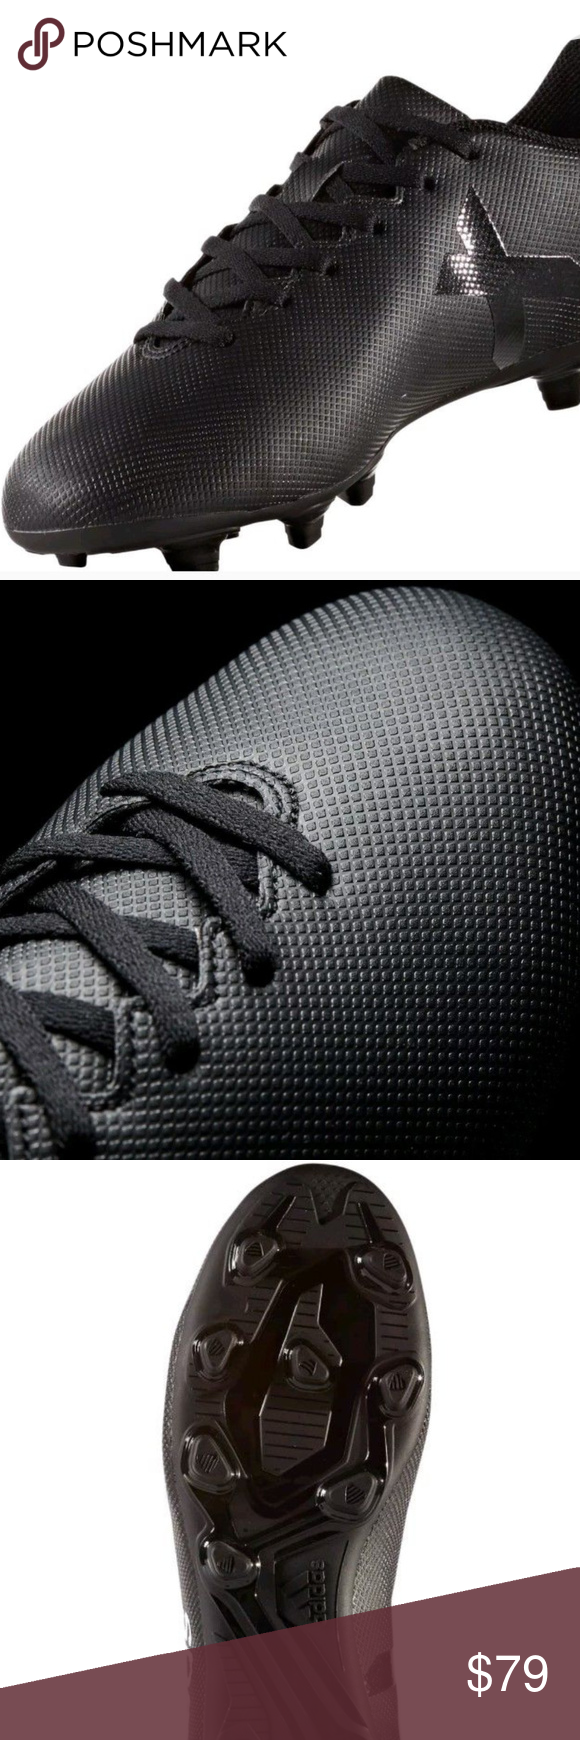 719fab8a687df7 Adidas Men s X 17.4 FG Black Soccer Cleats Size 8 Brand NEW Adidas Men s X  17.4